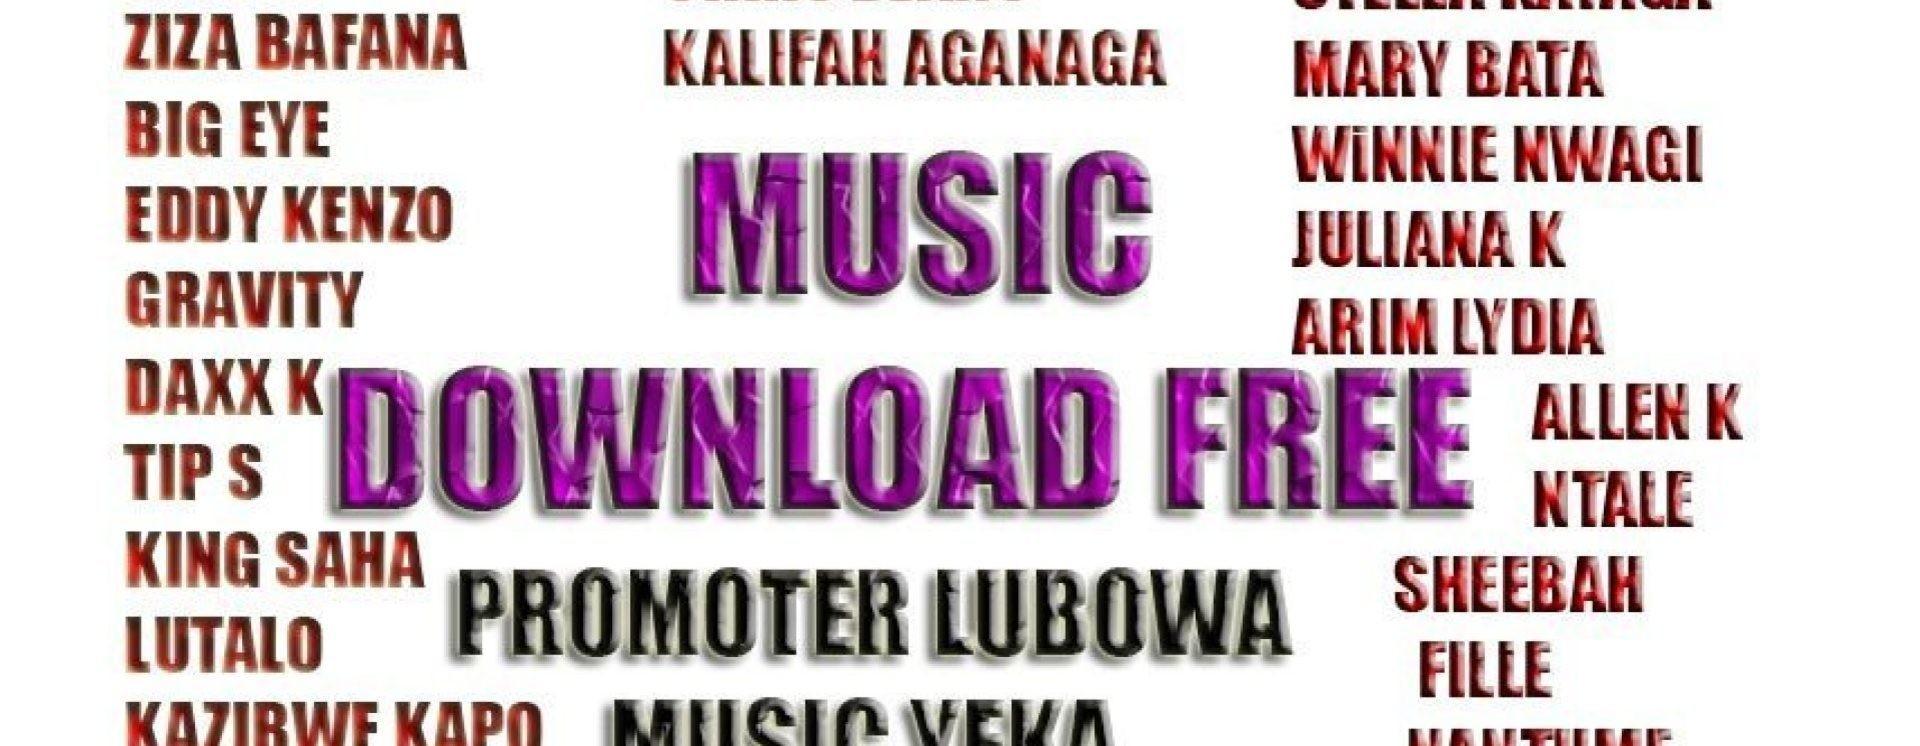 Ompanise by Naira Ali (buganda music mp3 0702616042 by